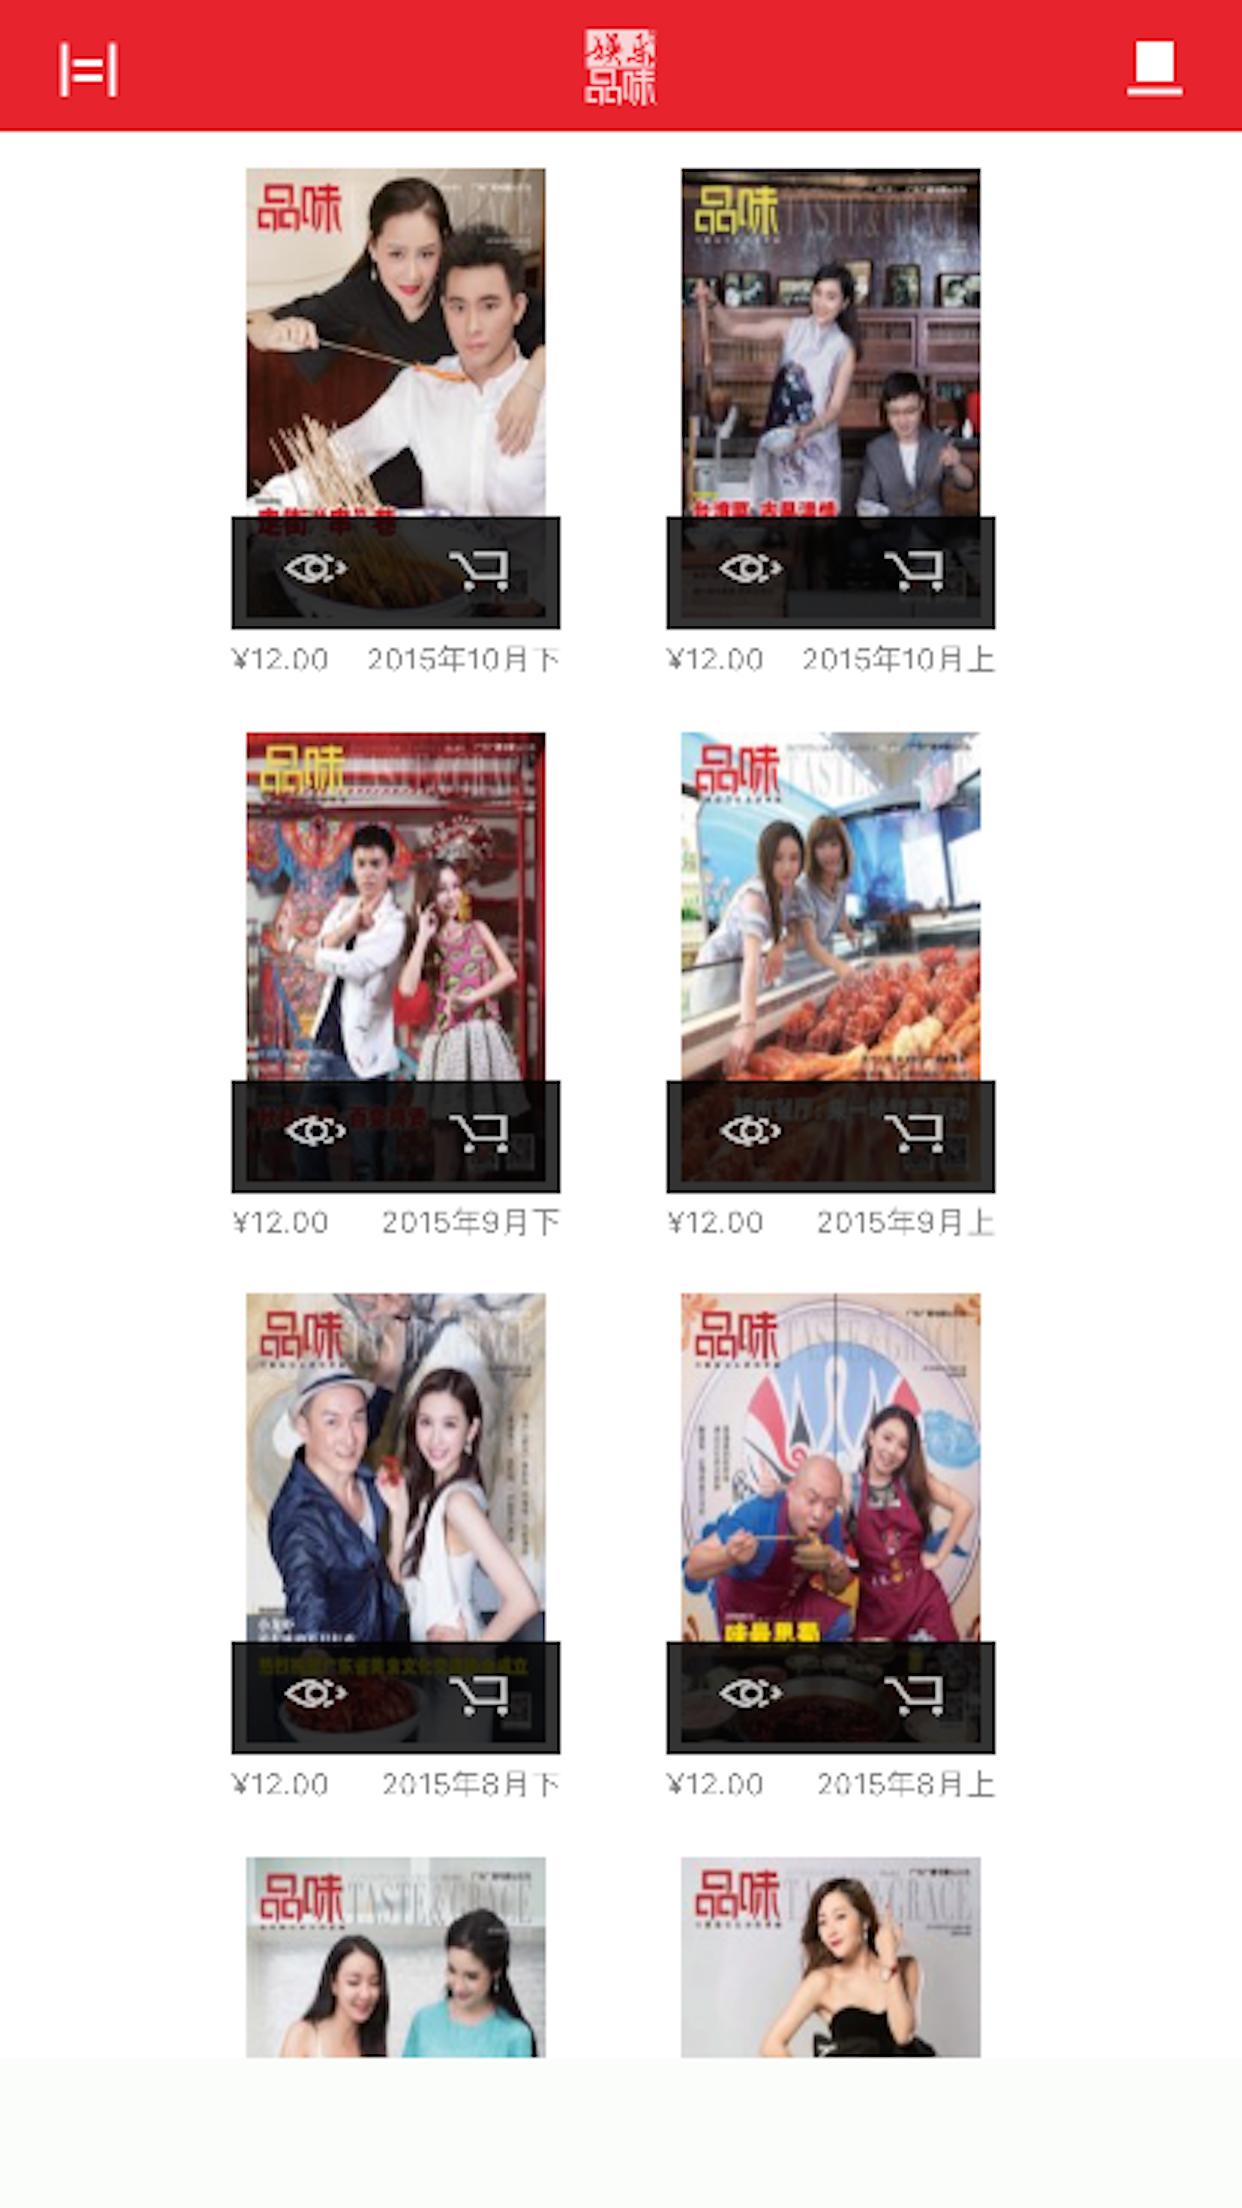 娱乐·品味周刊 Screenshot